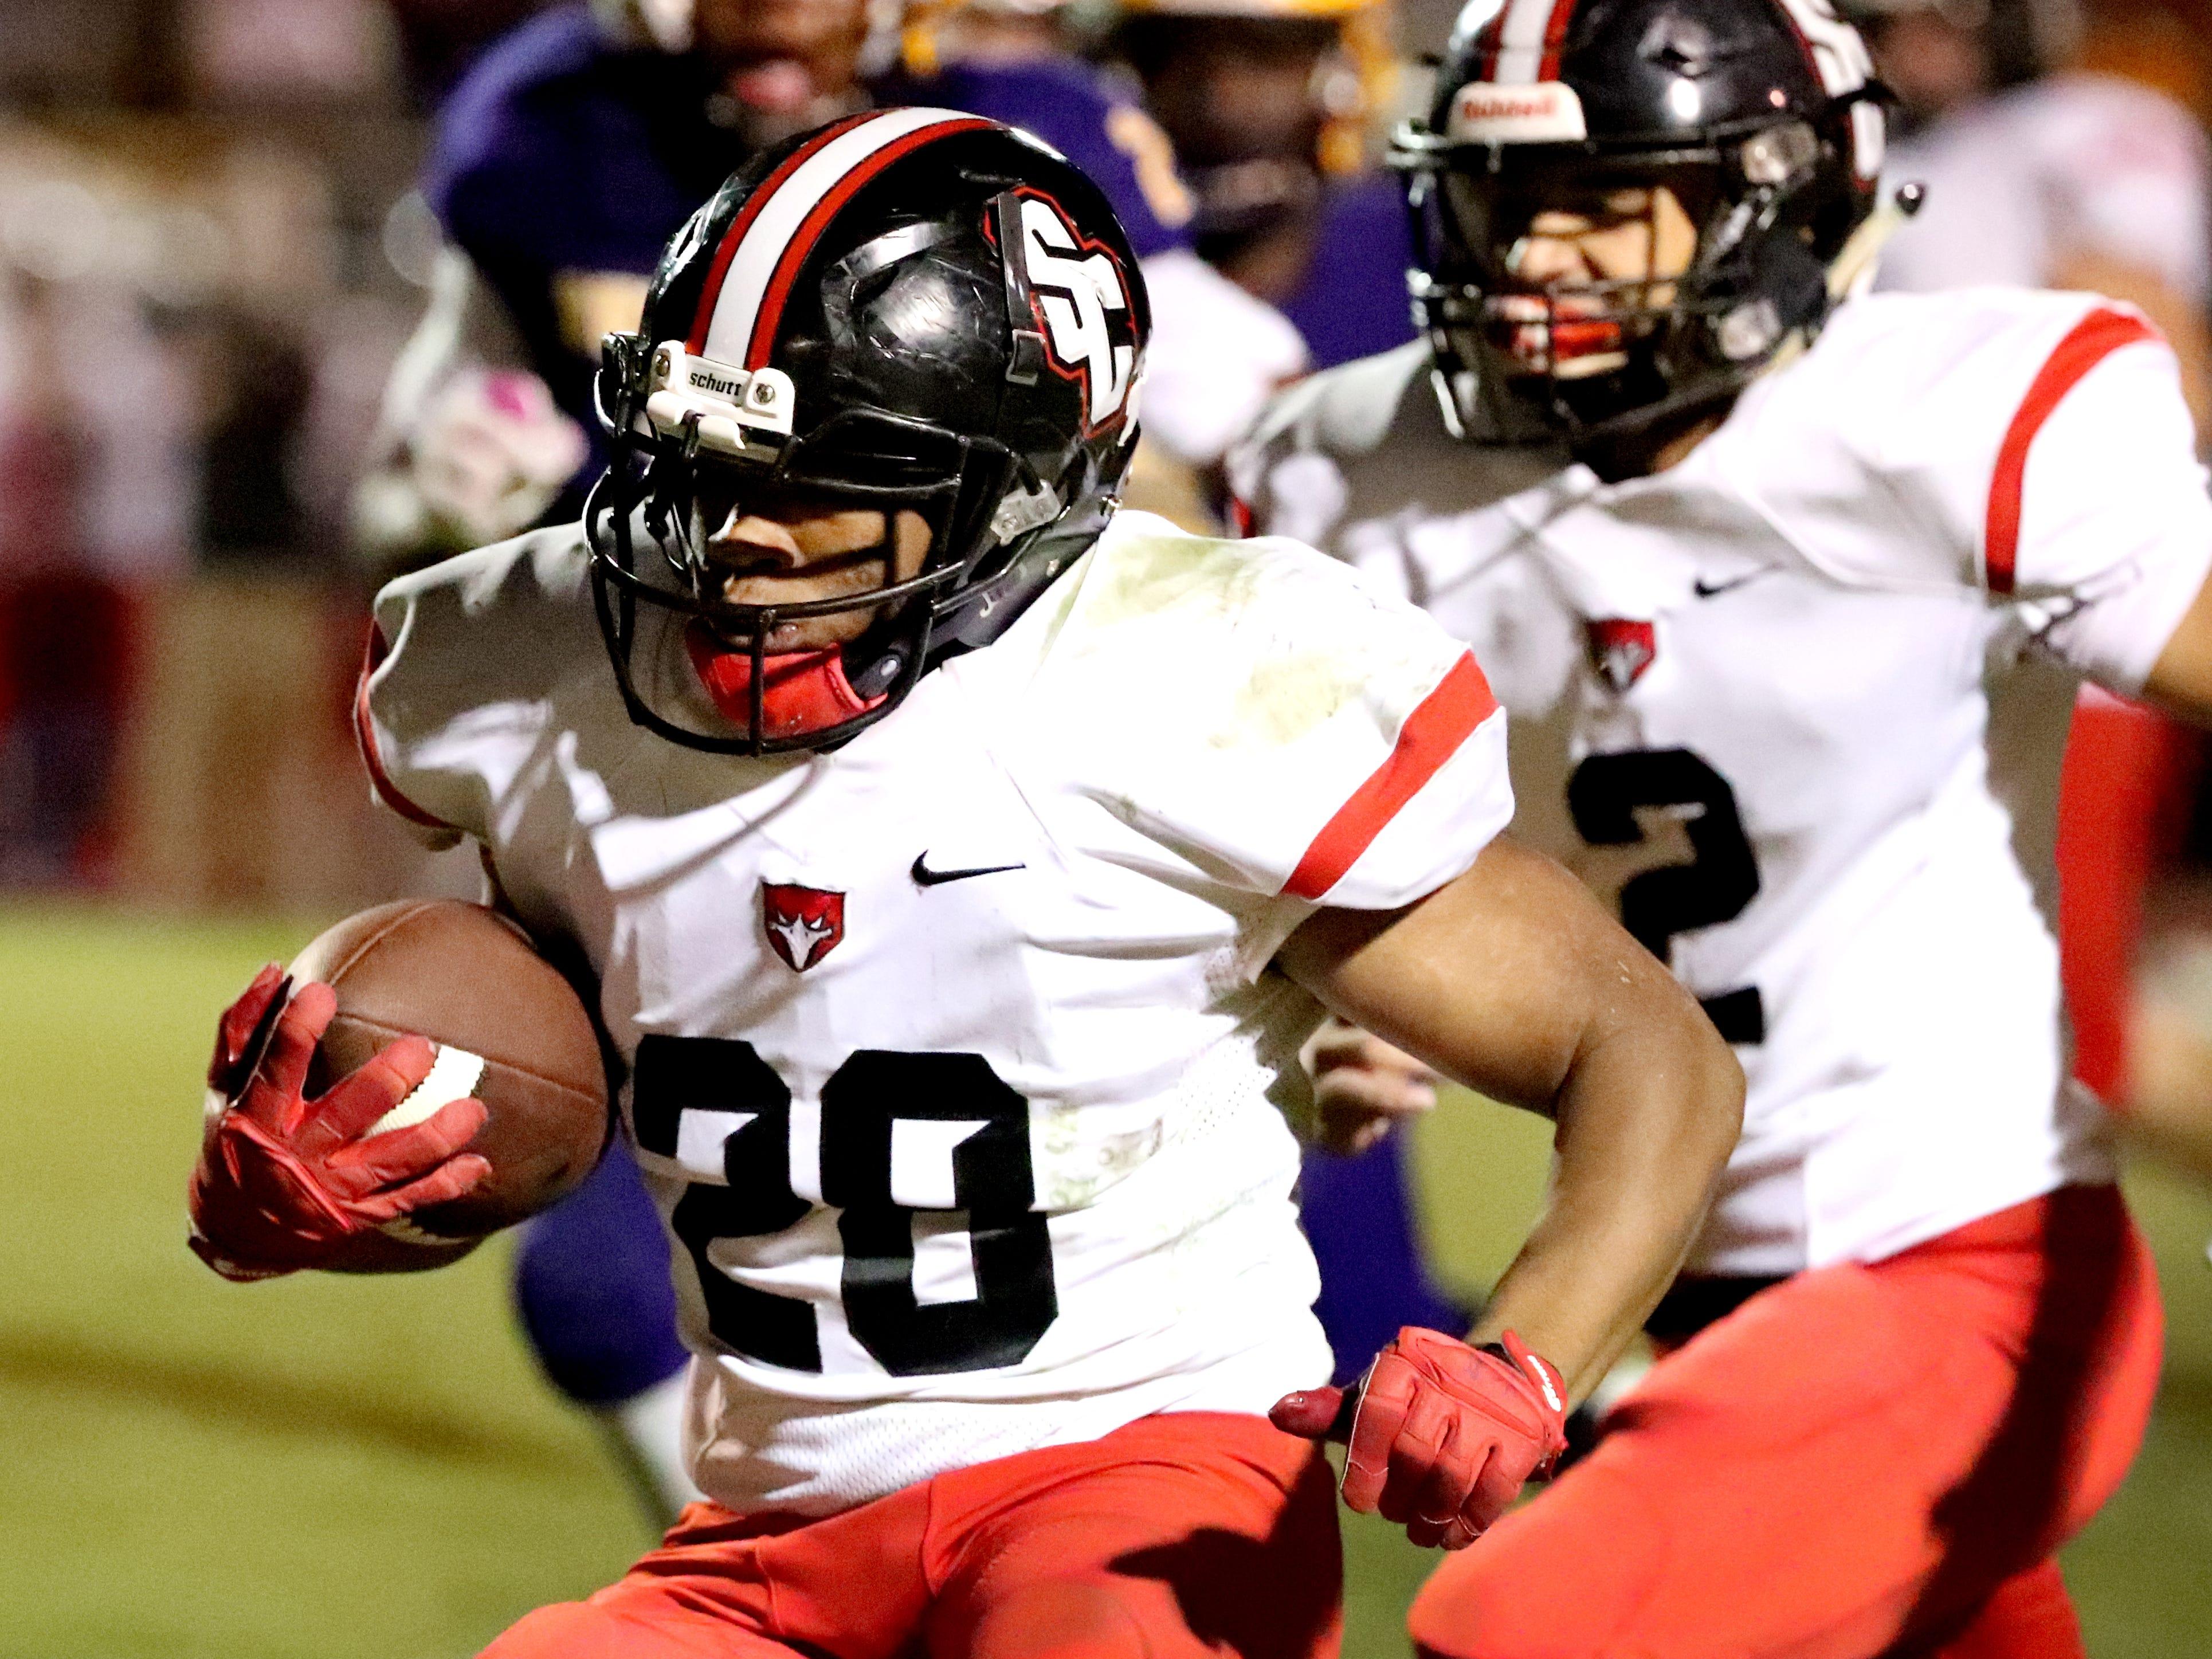 Stewarts Creek's Nathan Wright (28) runs the ball against Smyrna at Smyrna High School on Friday, Oct. 12, 2018.